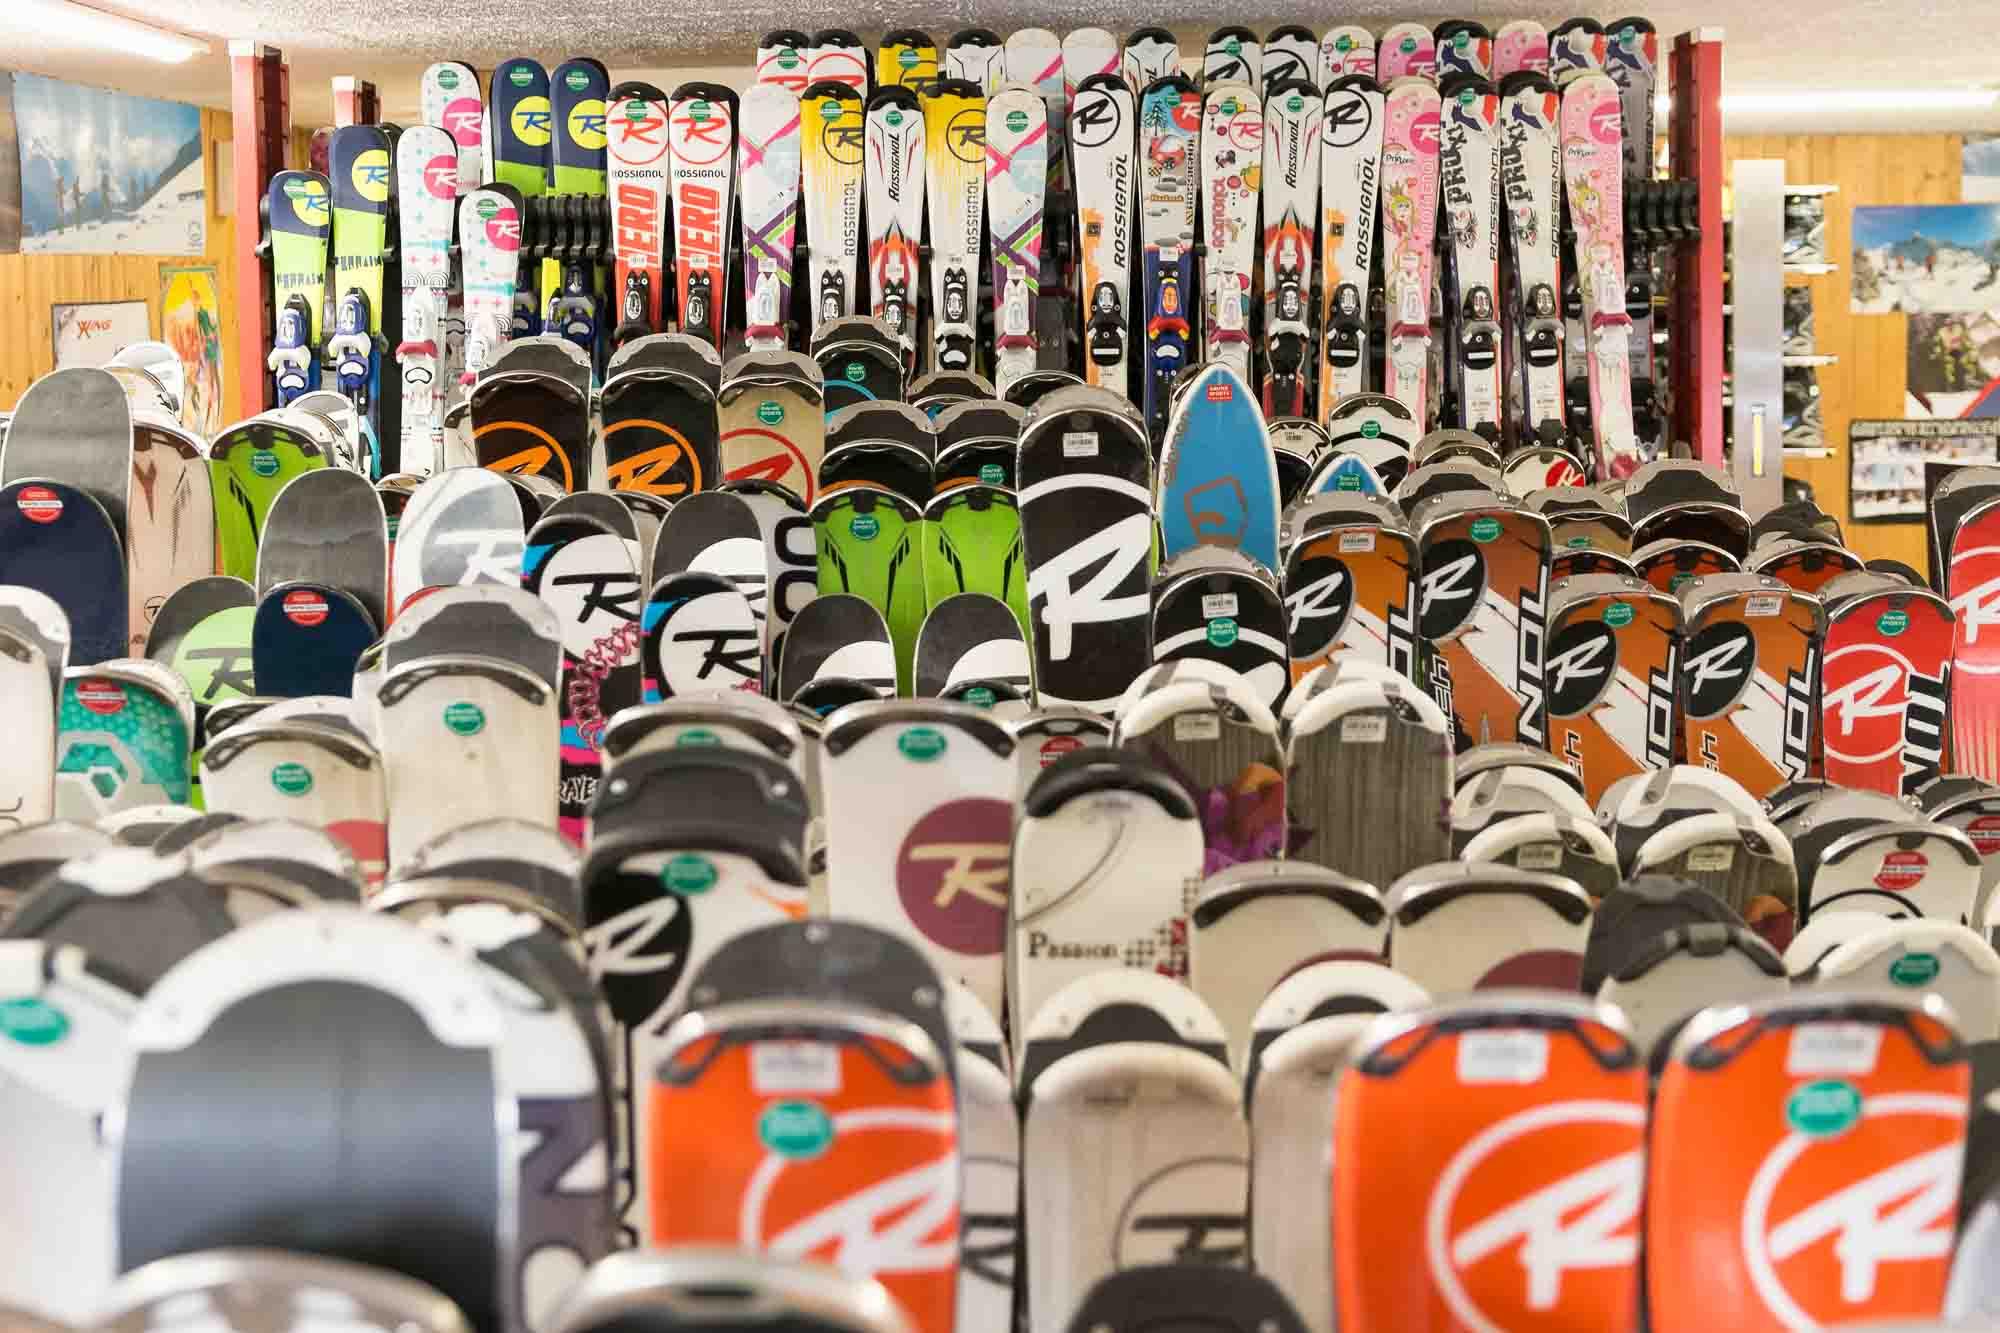 espace ski de location